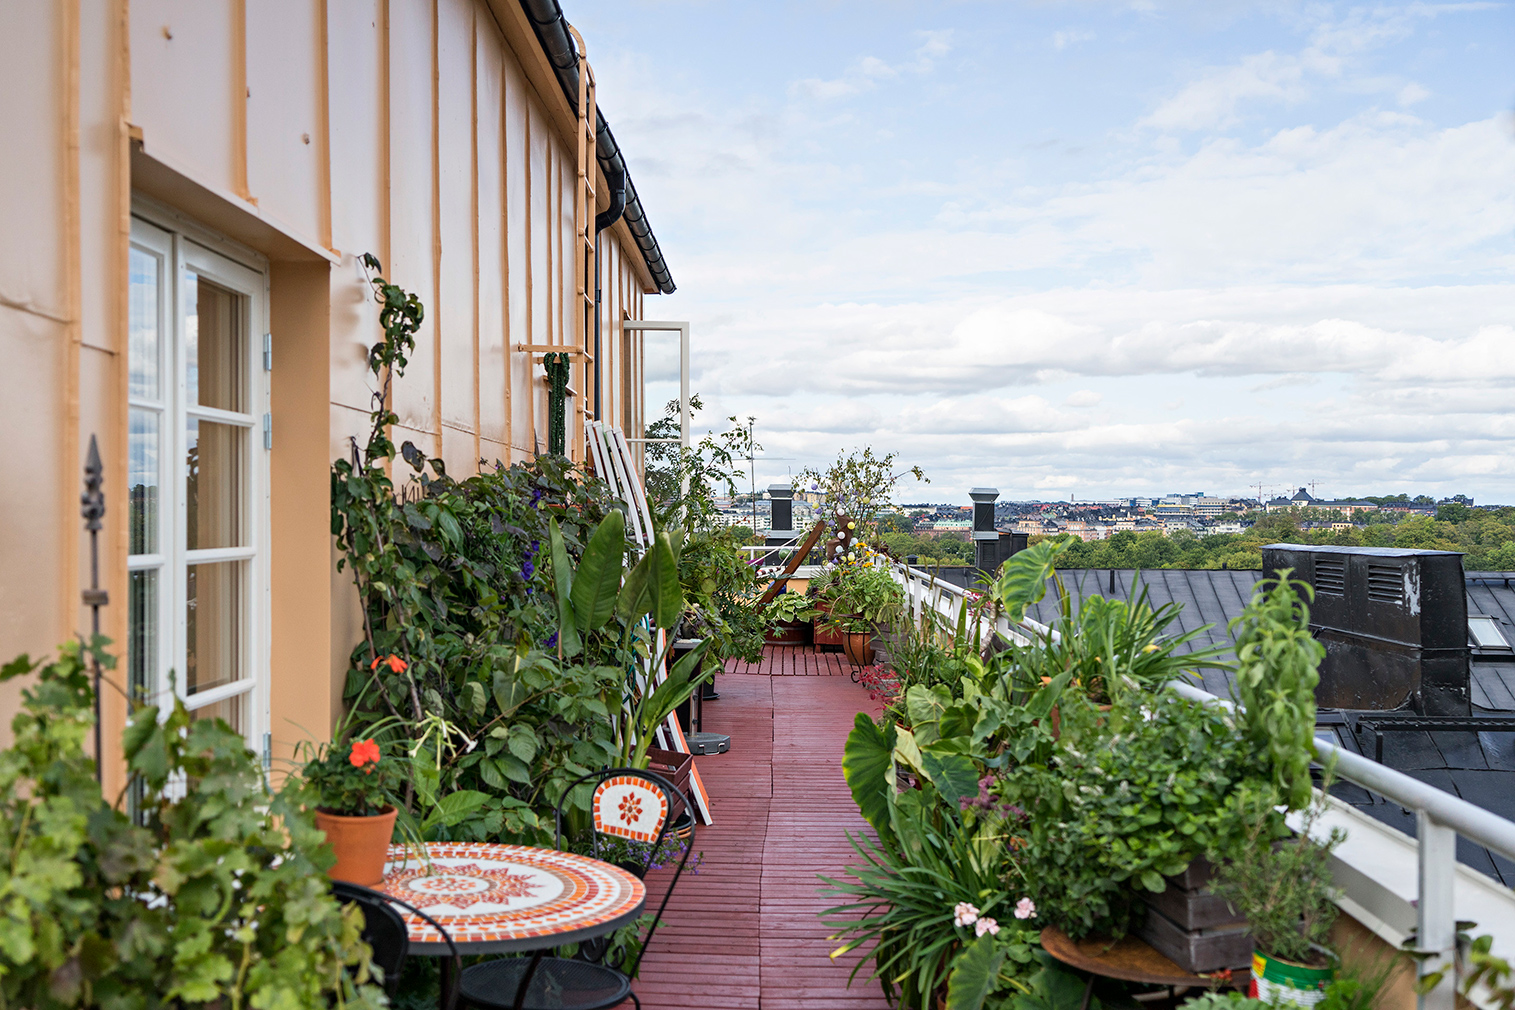 Rooftop cottage for sale in Stockholm